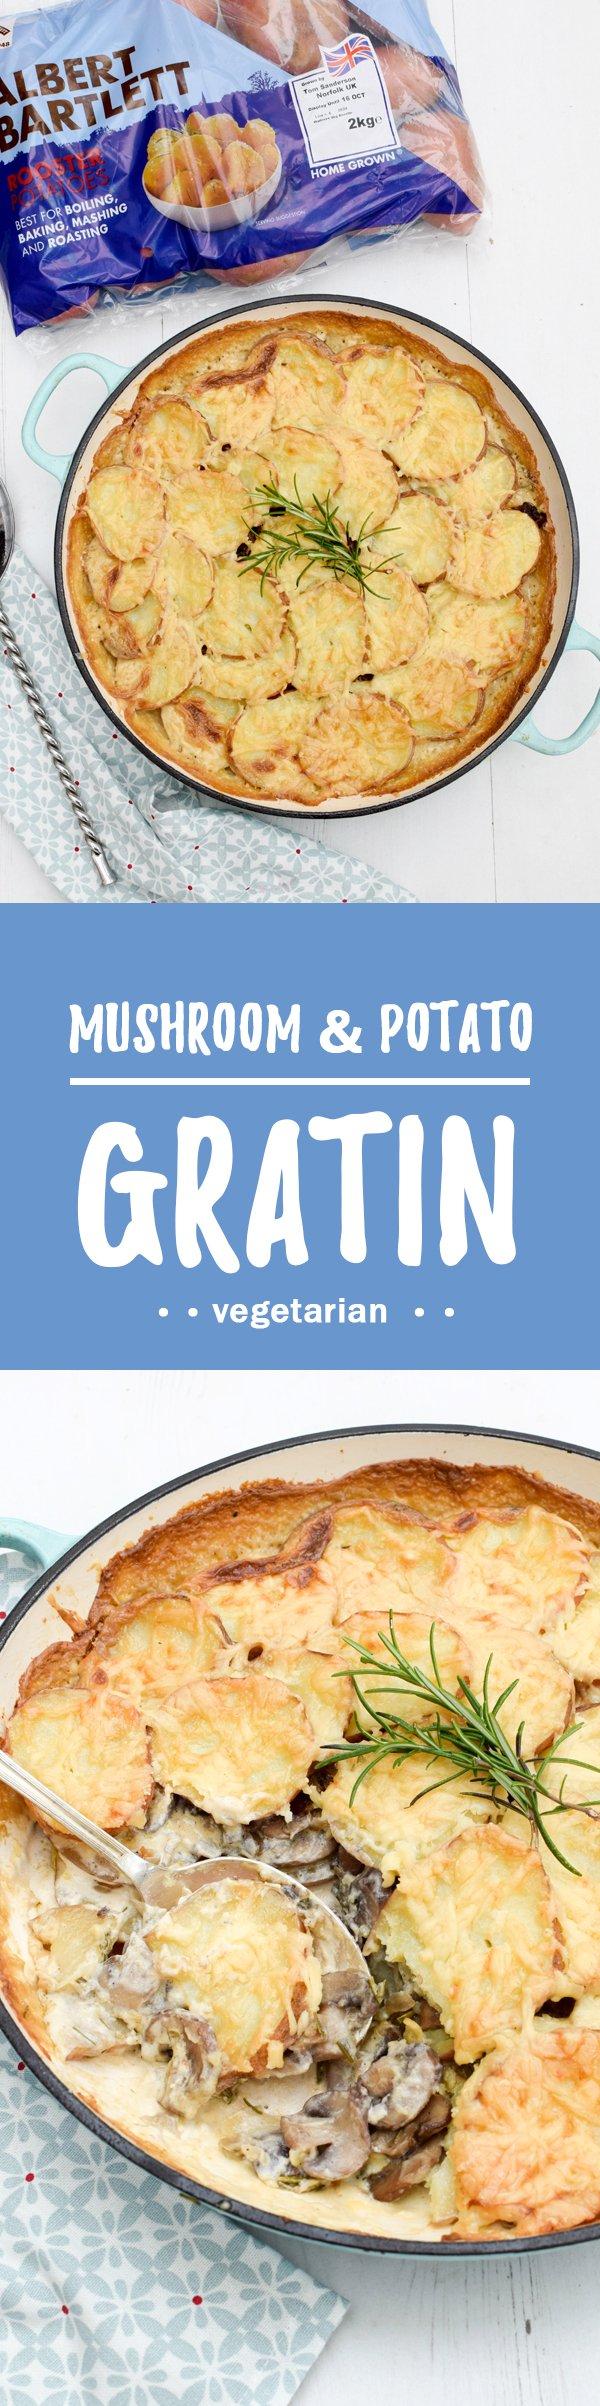 Mushroom & Potato Gratin [vegetarian] by The Flexitarian